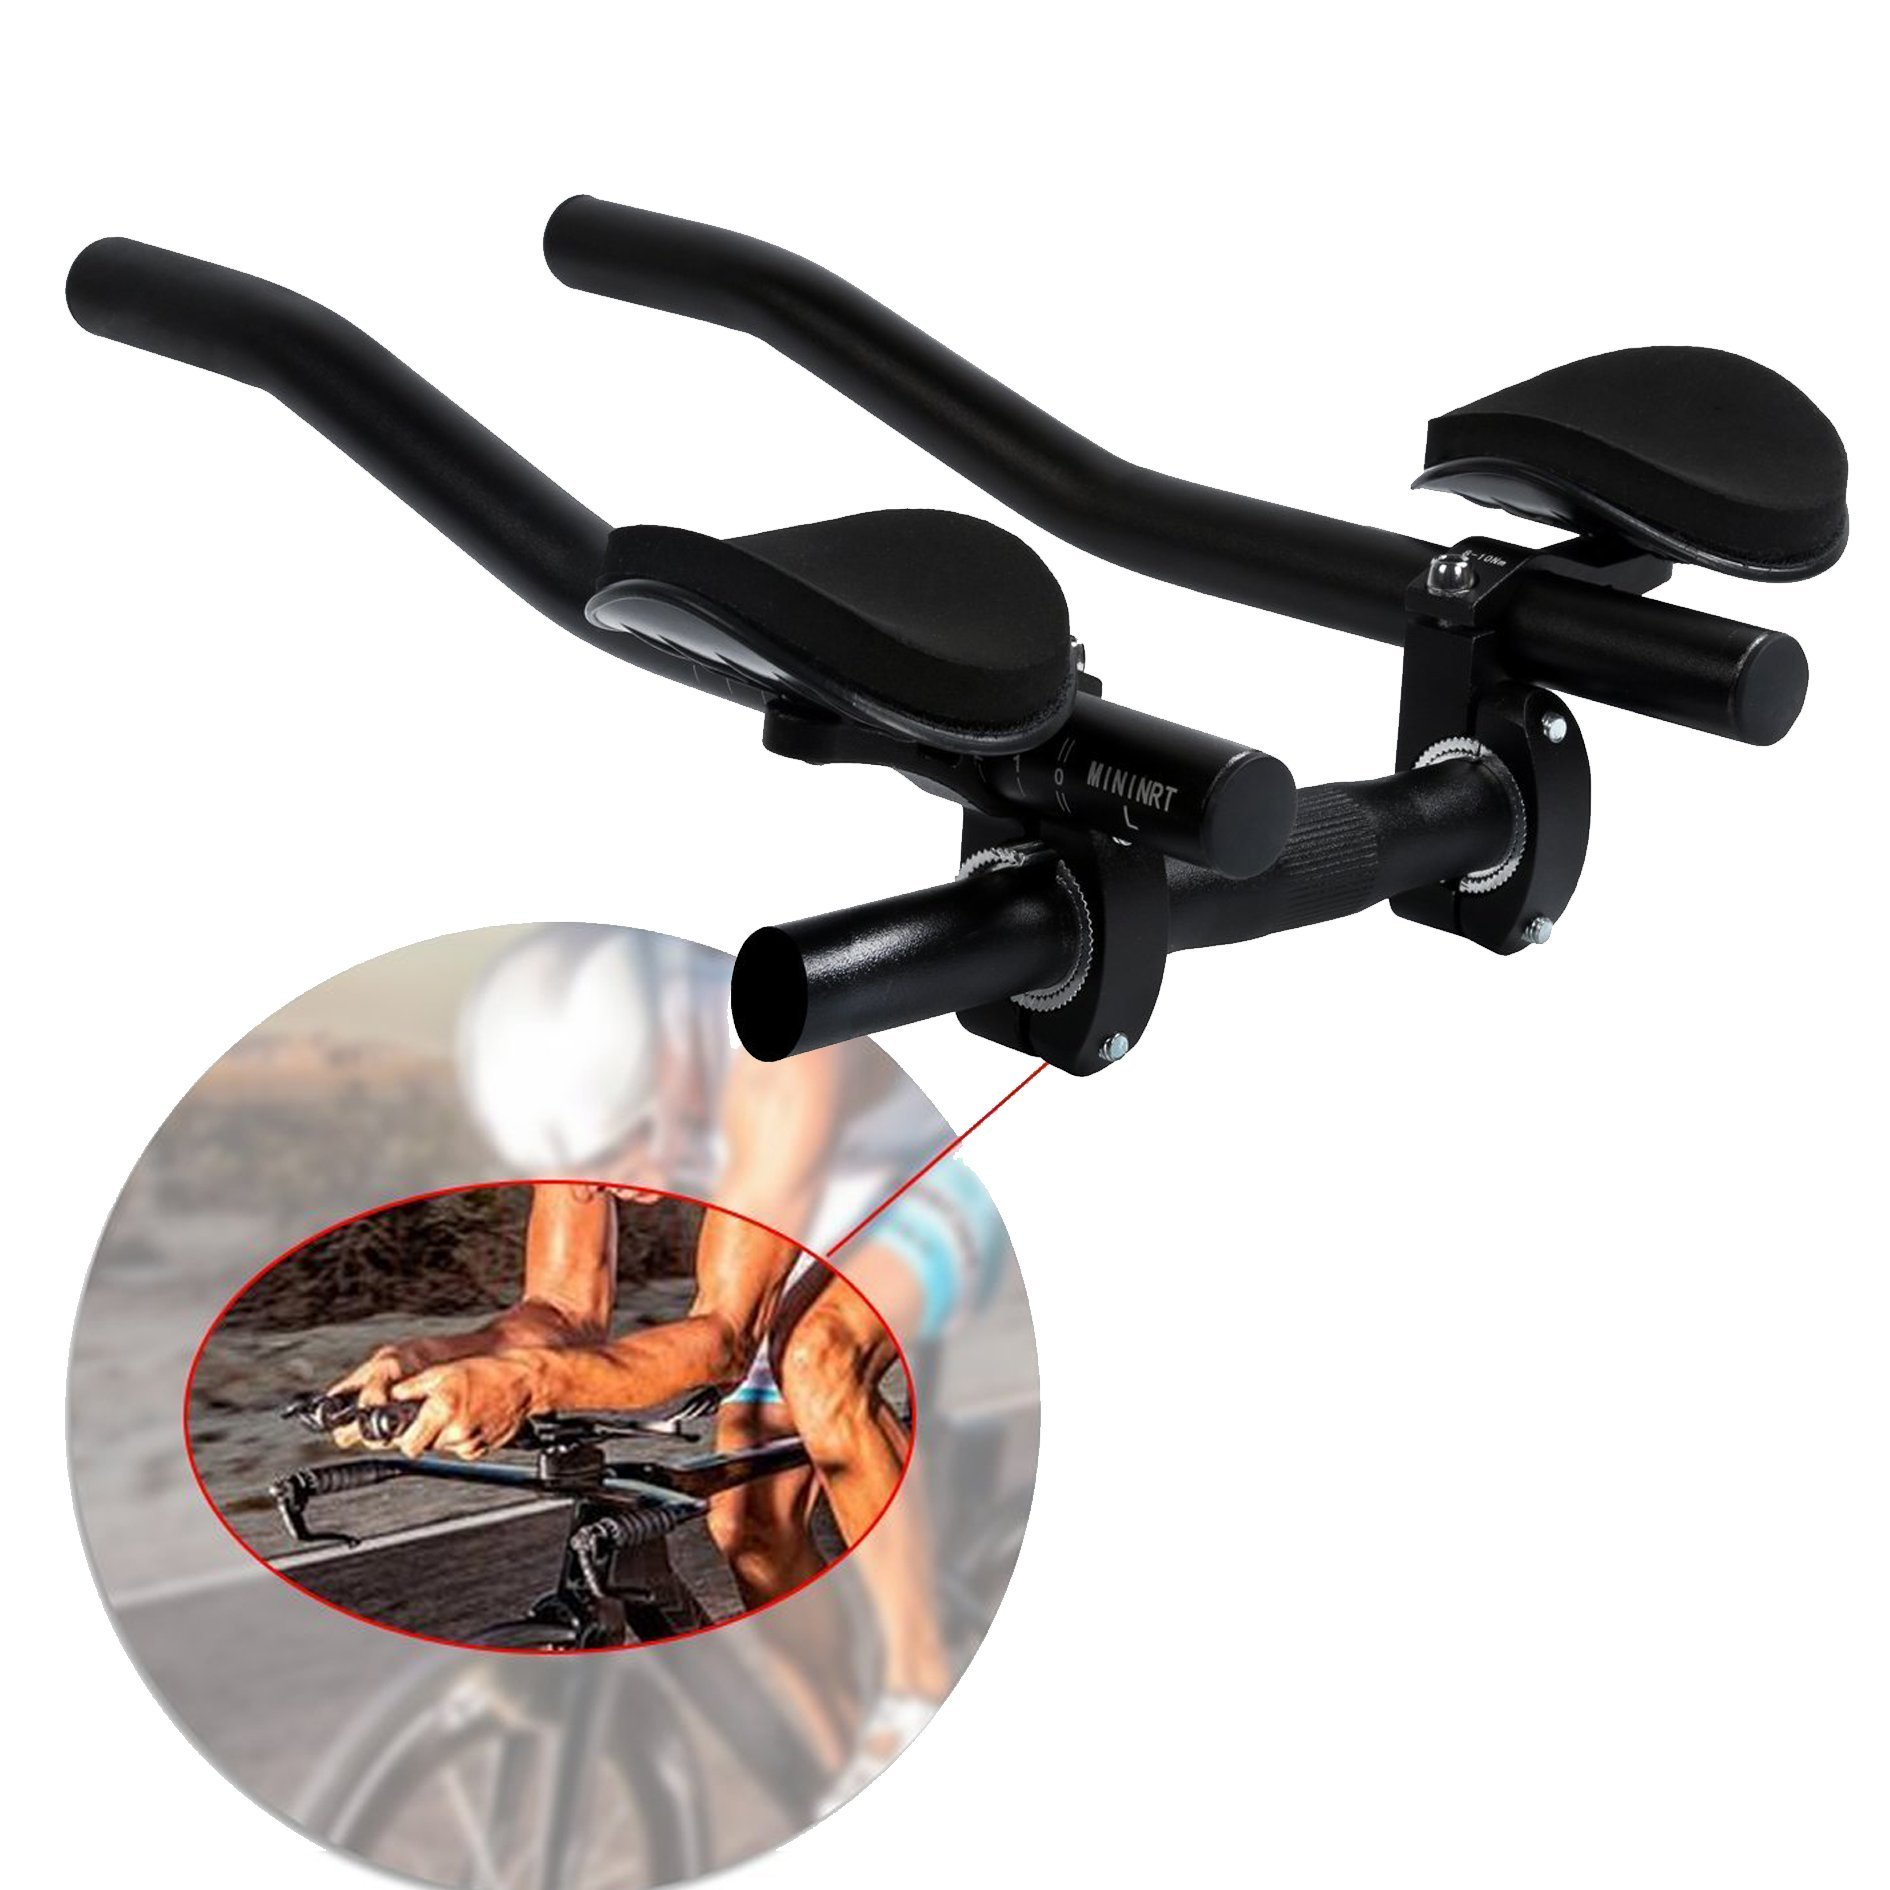 4ccef55af4e Get Quotations · Handlebars hybike T6 Aero Bars Triathlon Handlebar  Extension TT bars for Mountain Bike or Road Bike